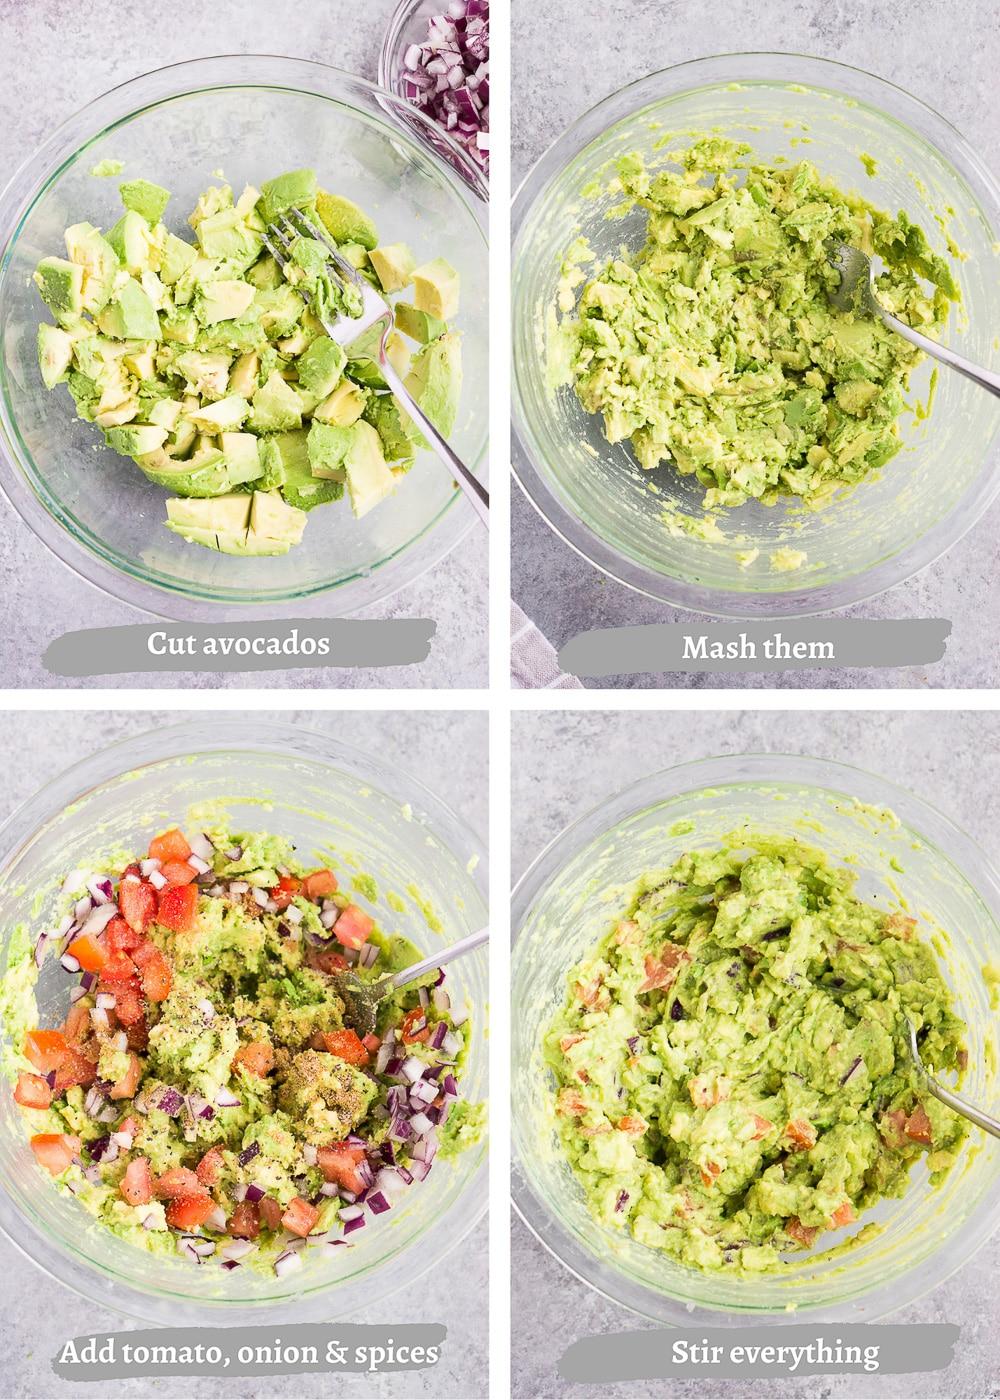 process shots of making guacamole